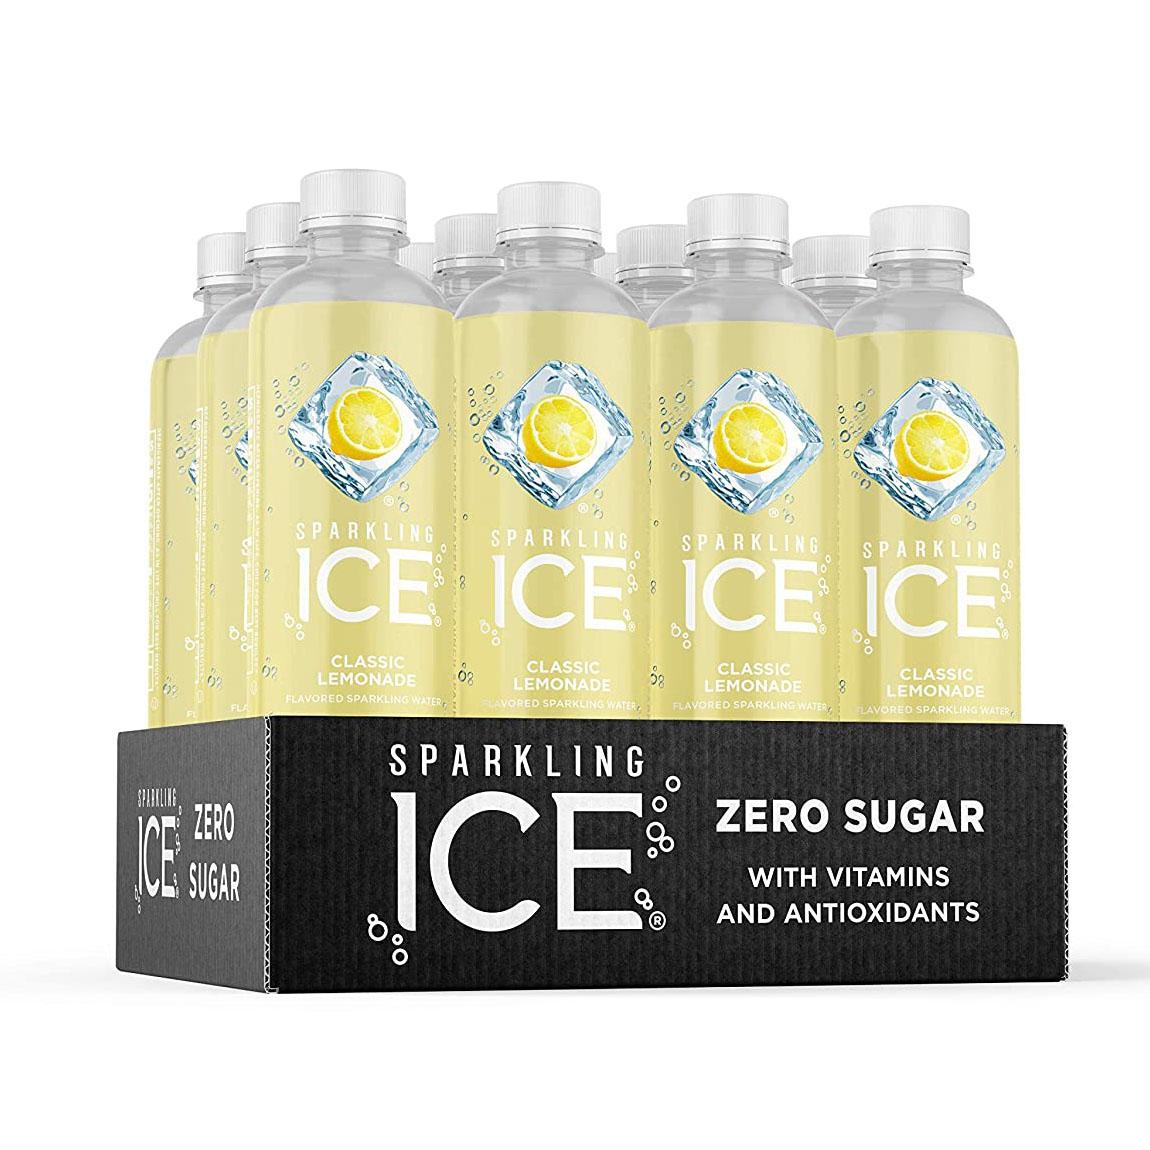 Sparkling Ice Lemonade